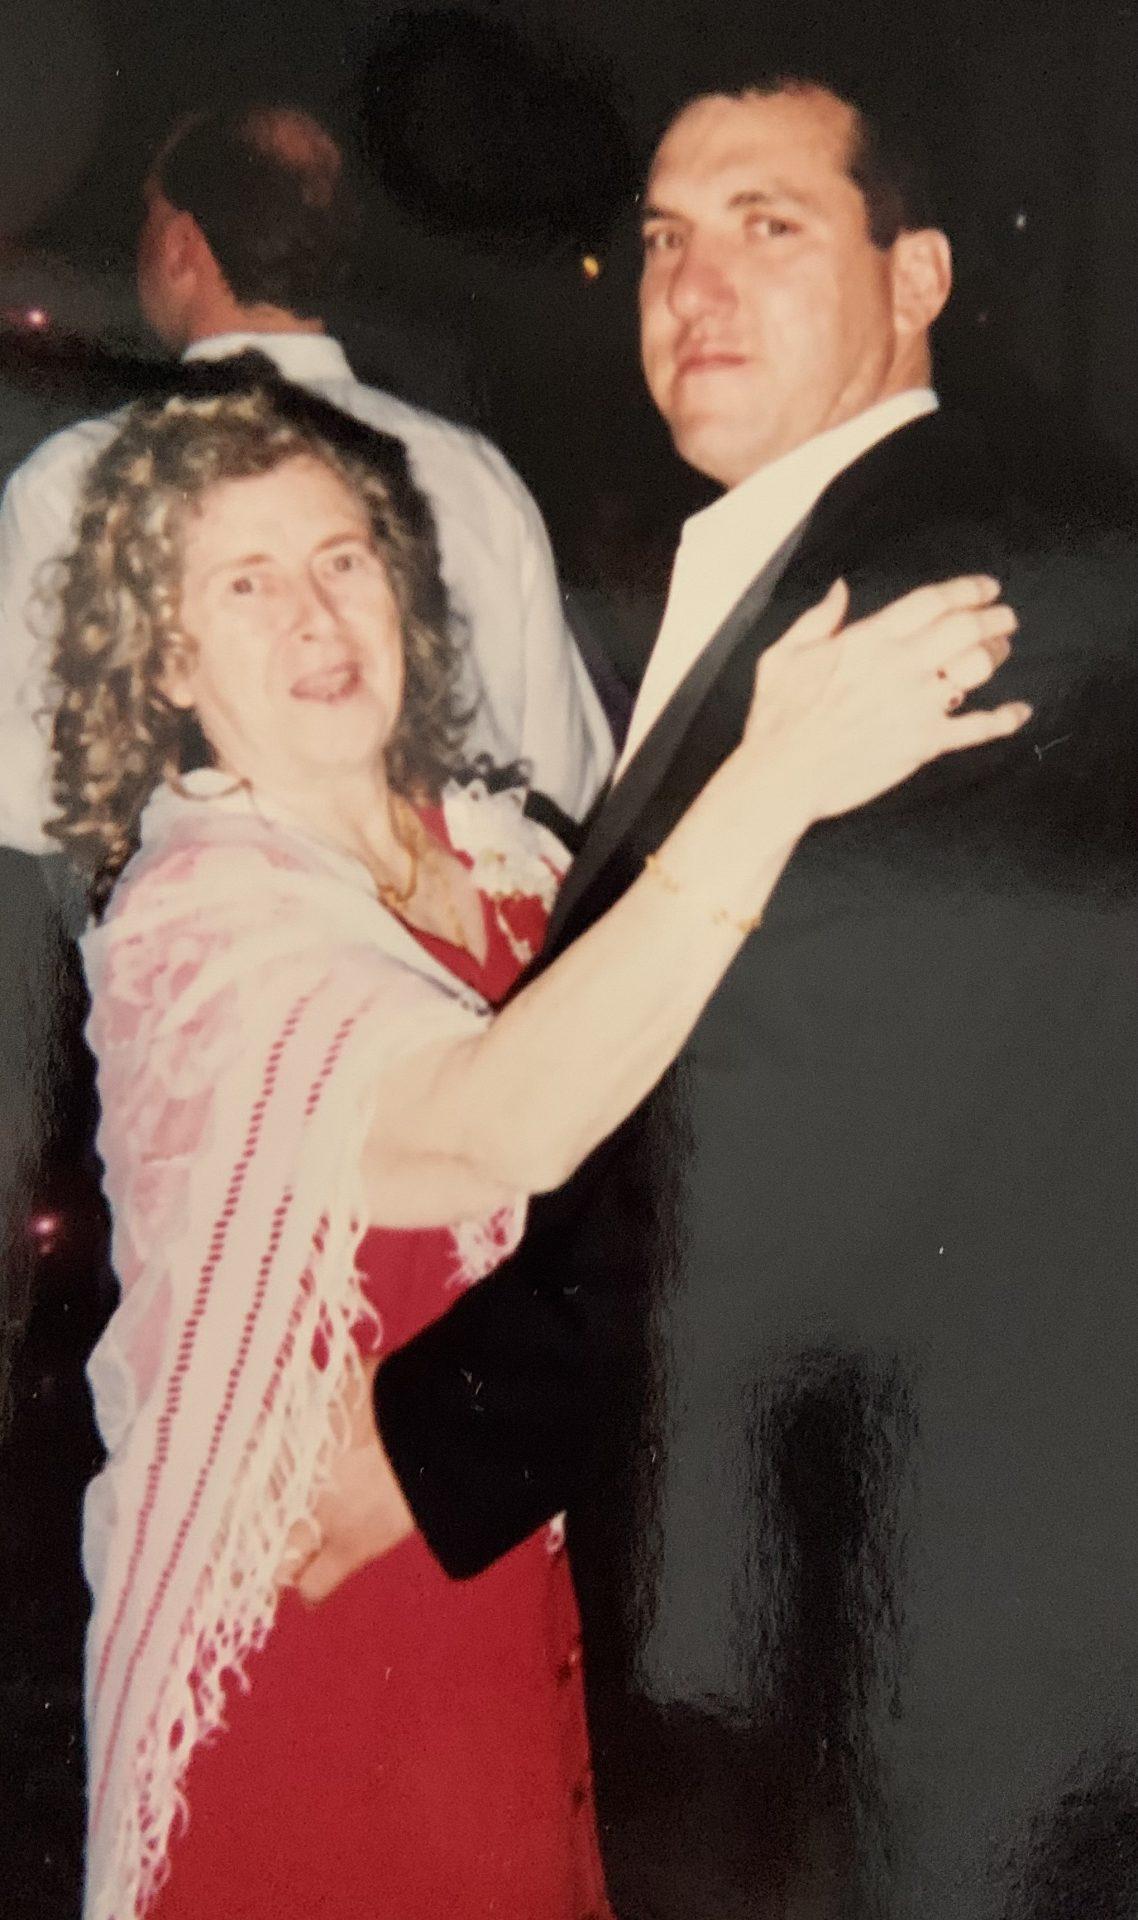 My mom and I at my wedding